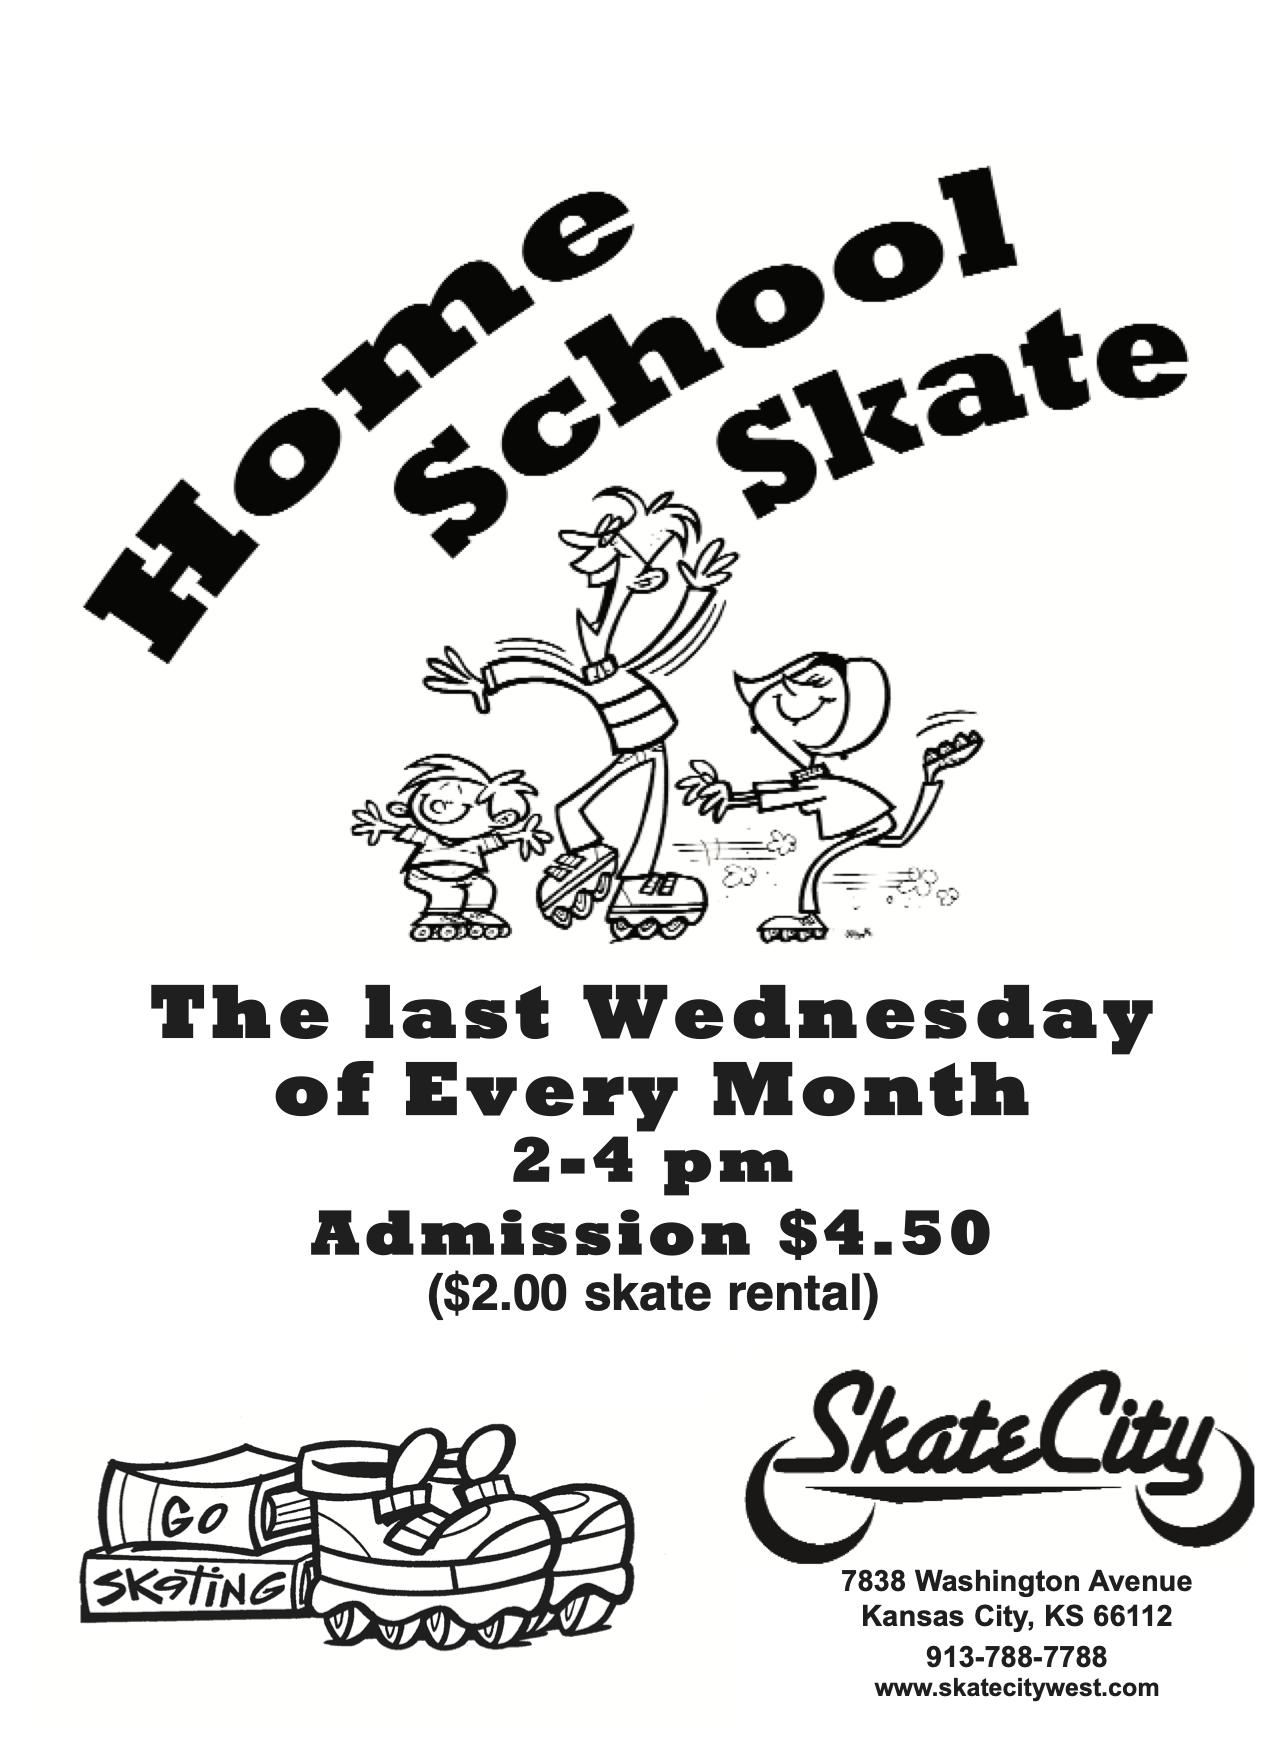 Home School KC West copy